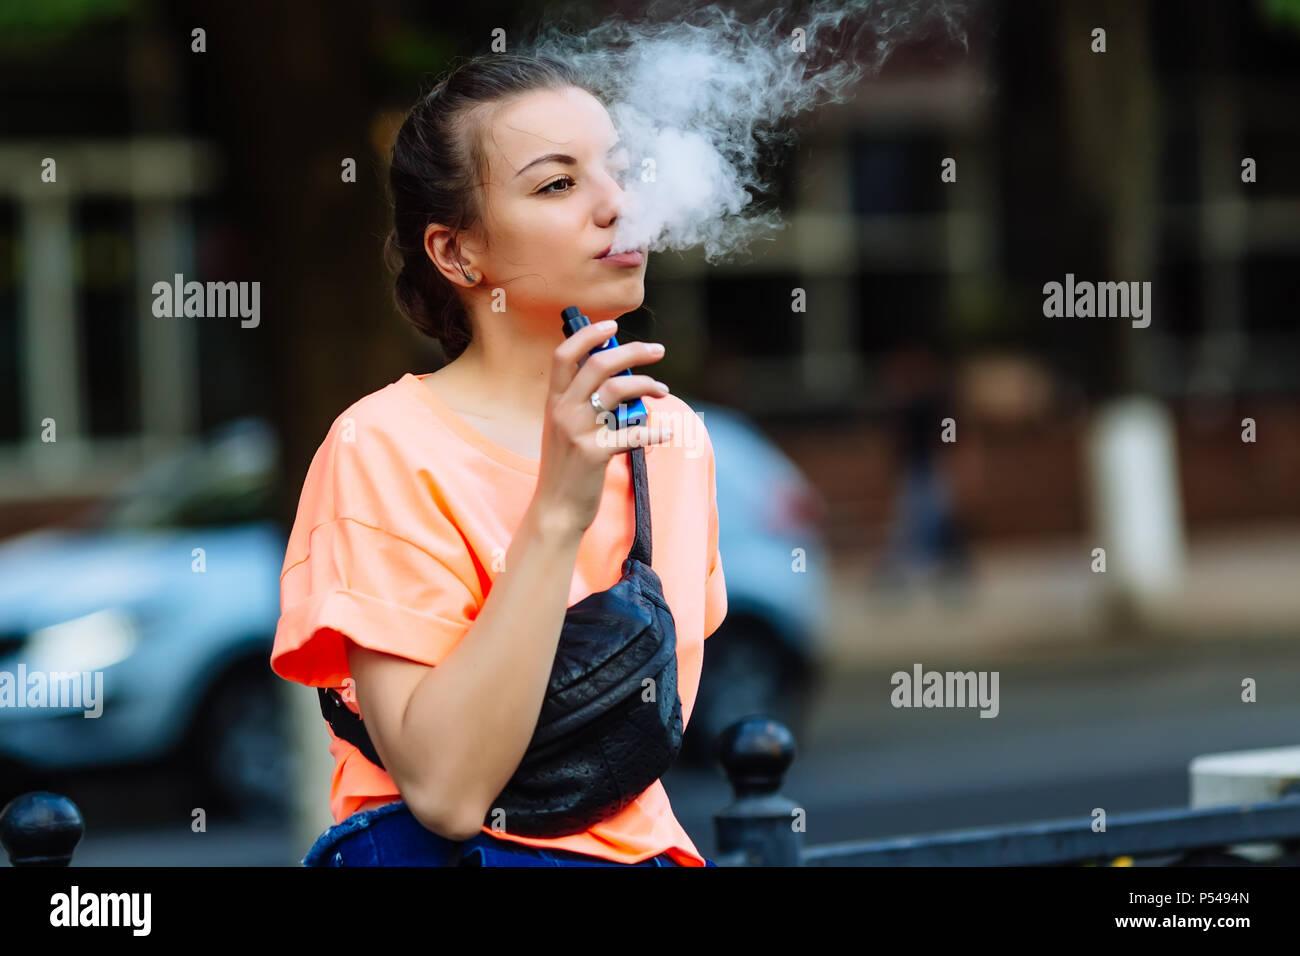 Pretty young girl vape popular ecig gadget,vaping device.Happy brunette vaper girl with e-cig.Portrait of smoker female model with electronic cigarett - Stock Image